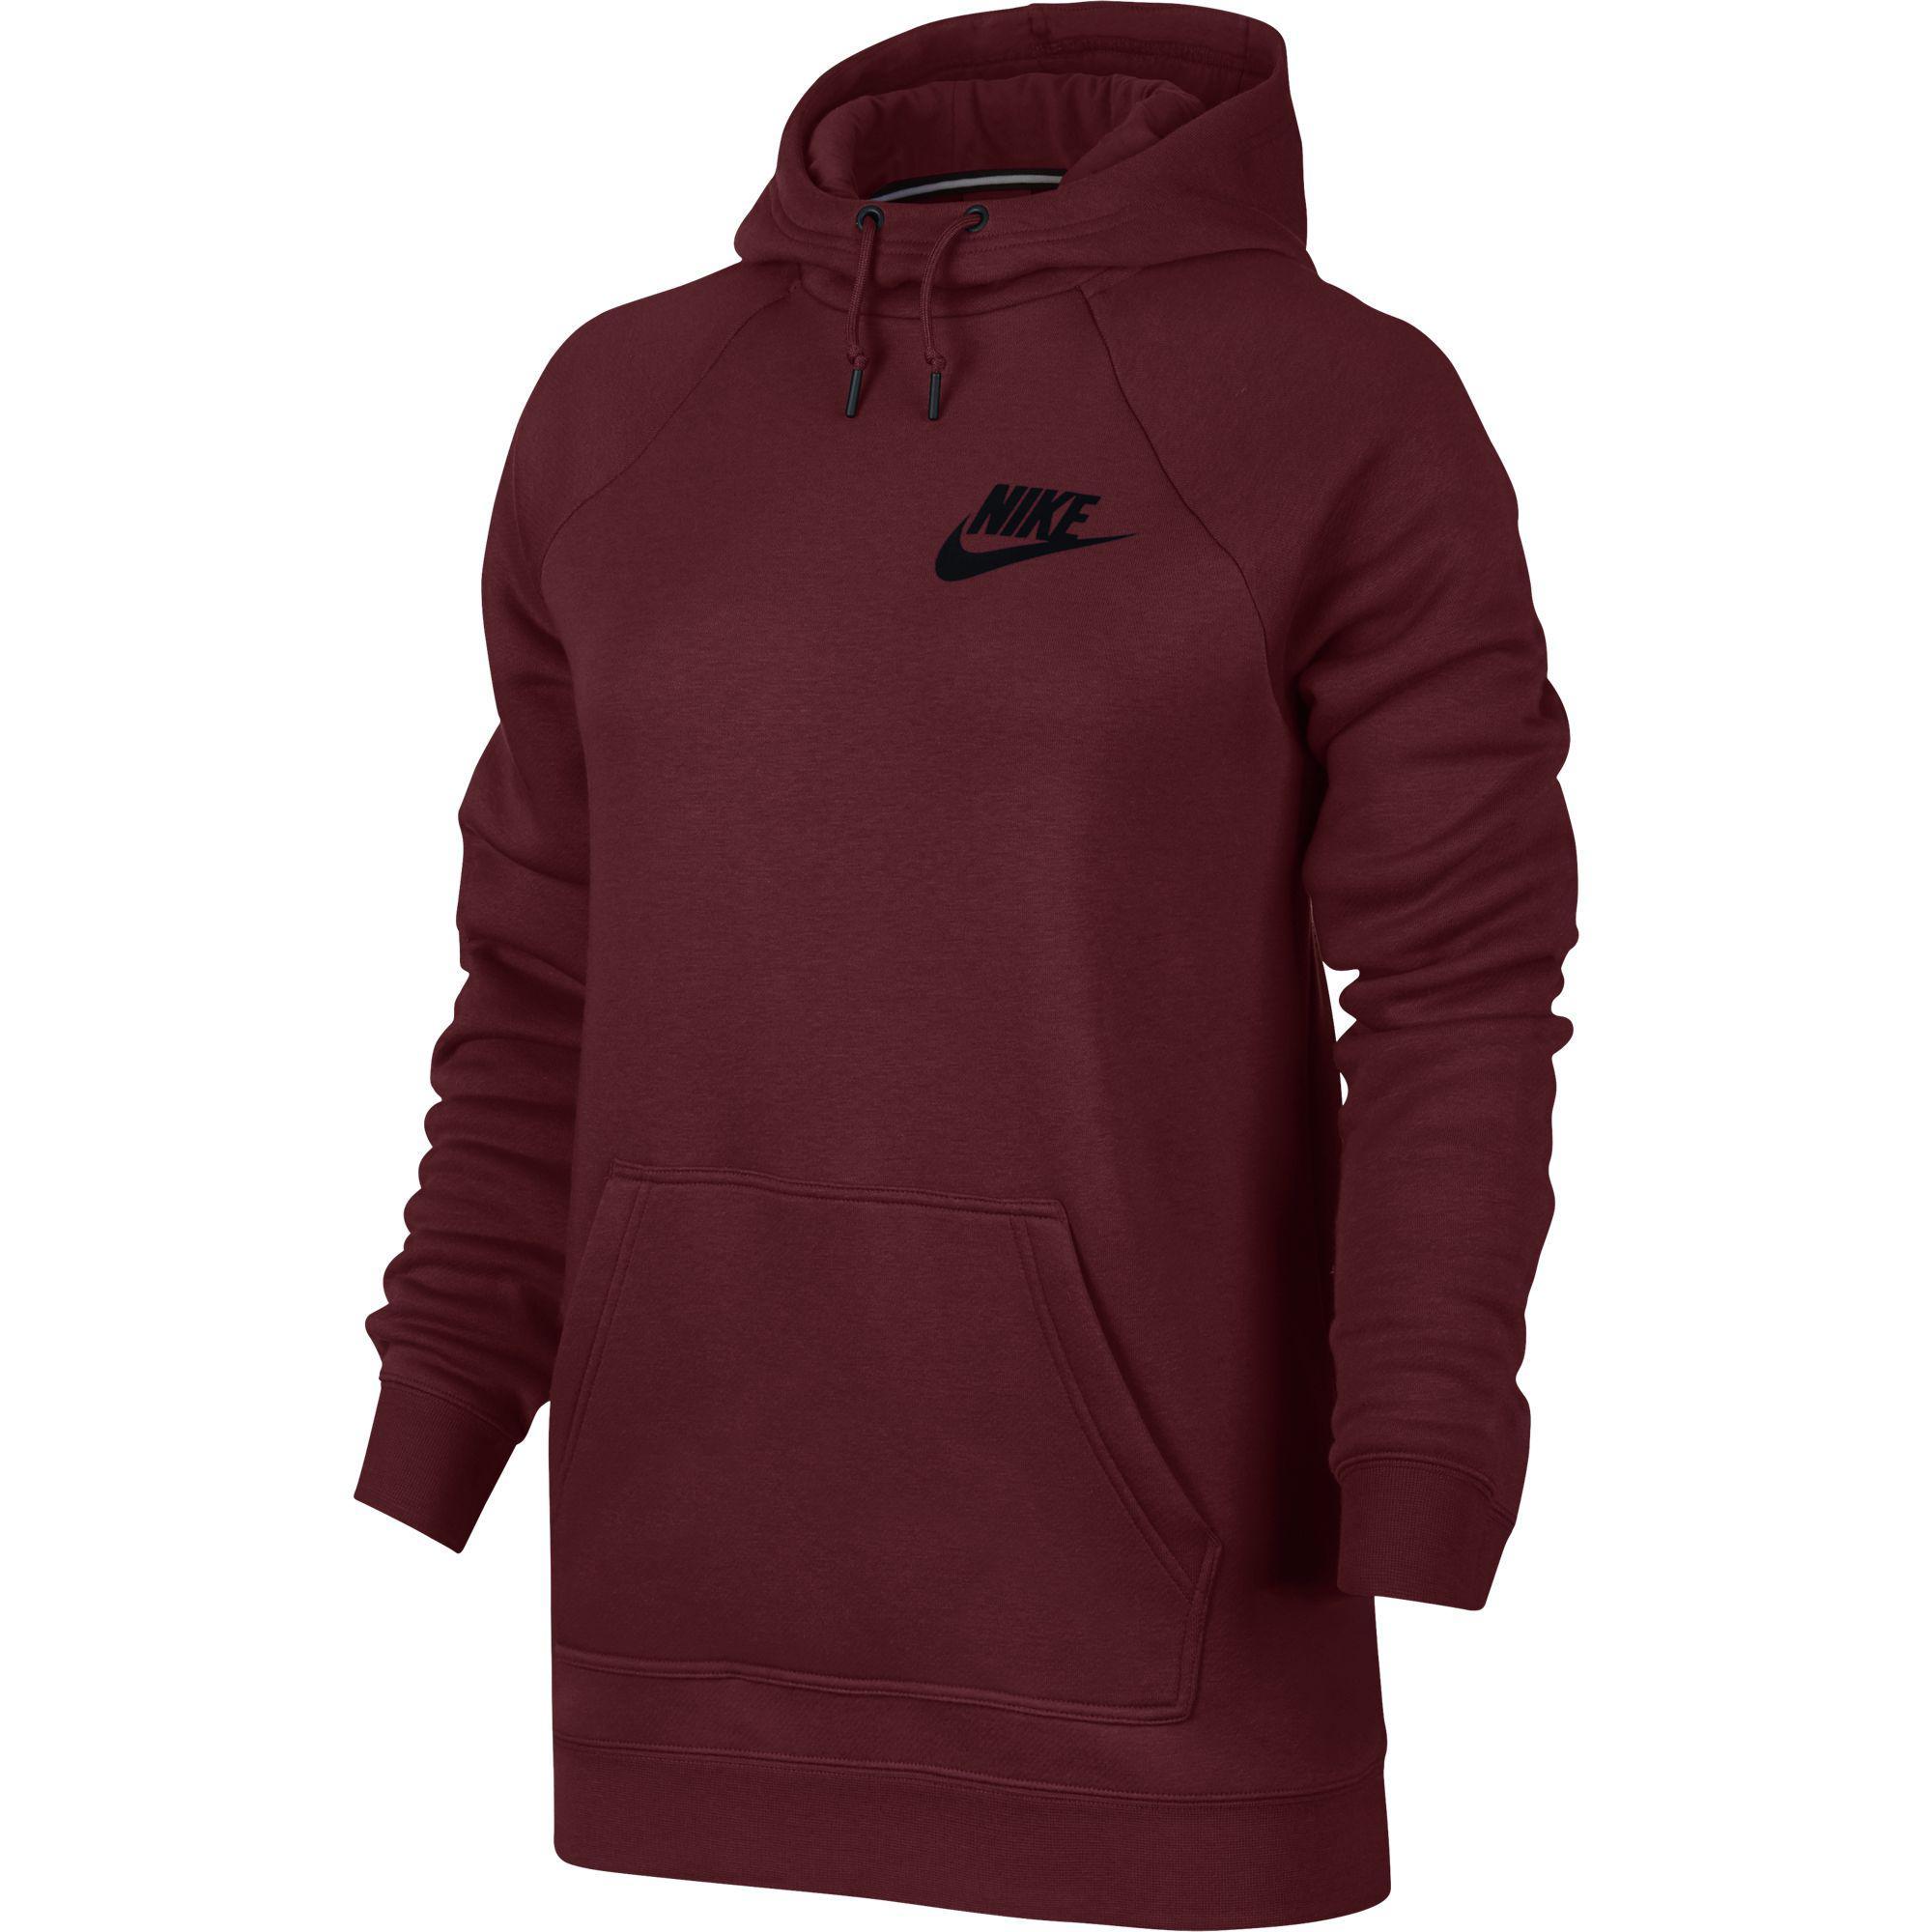 Nike Womens Sportswear Rally Hoodie - Team Red Black - Tennisnuts.com 406d96b48